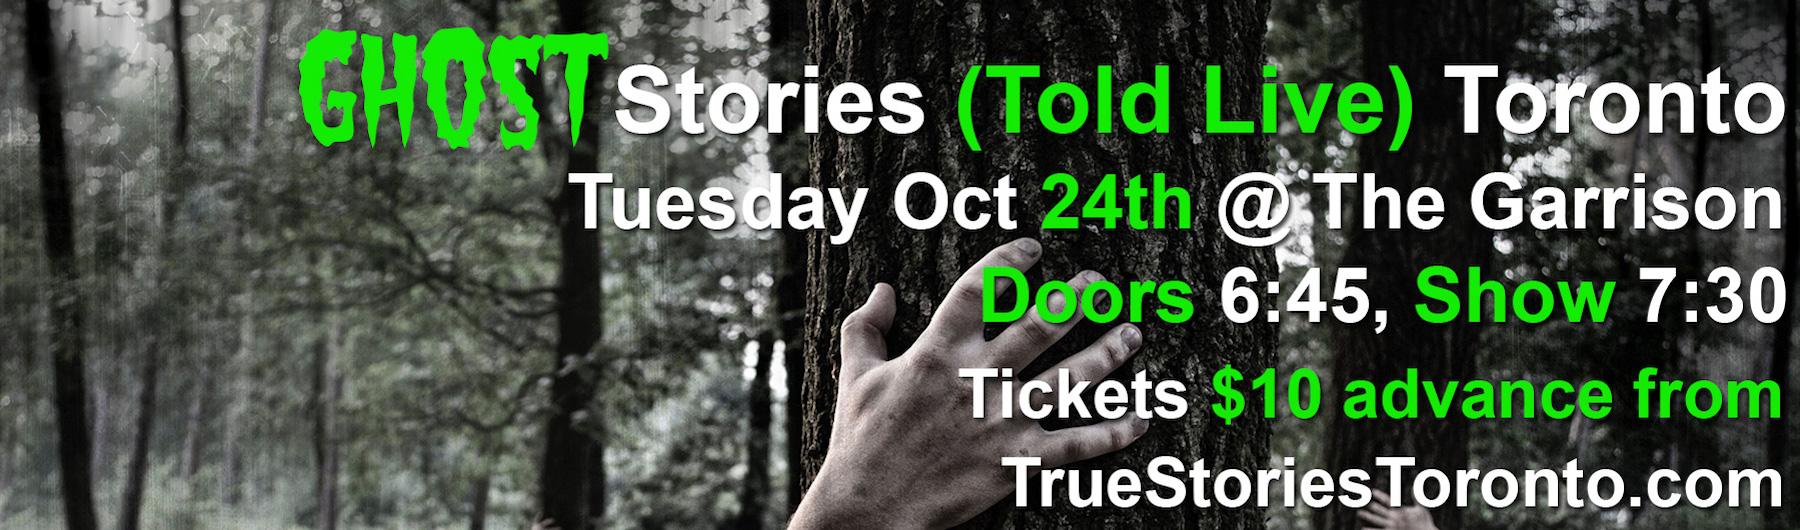 Ghost Stories Toronto 2017